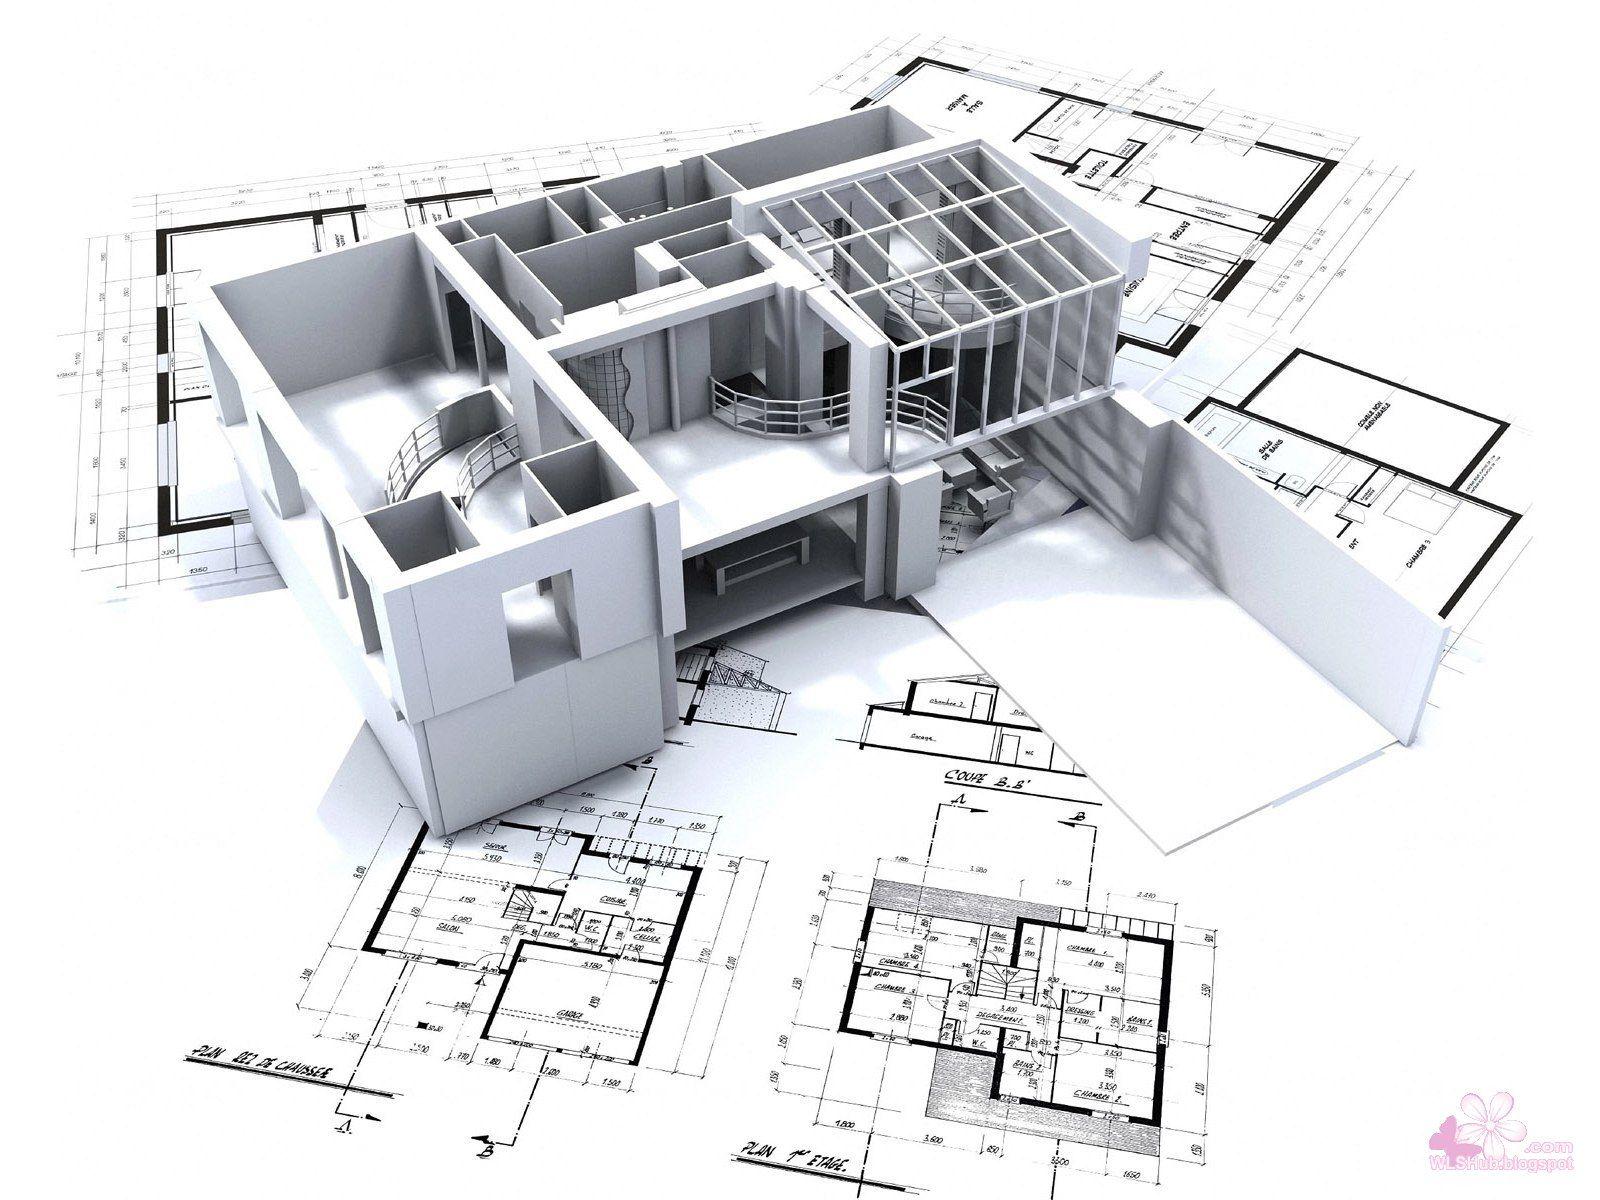 Architectural Symbols Design Basic 3 On Architecture Design Home Design Inspirations Blueprint Symbols Drawing Book Pdf Blueprints